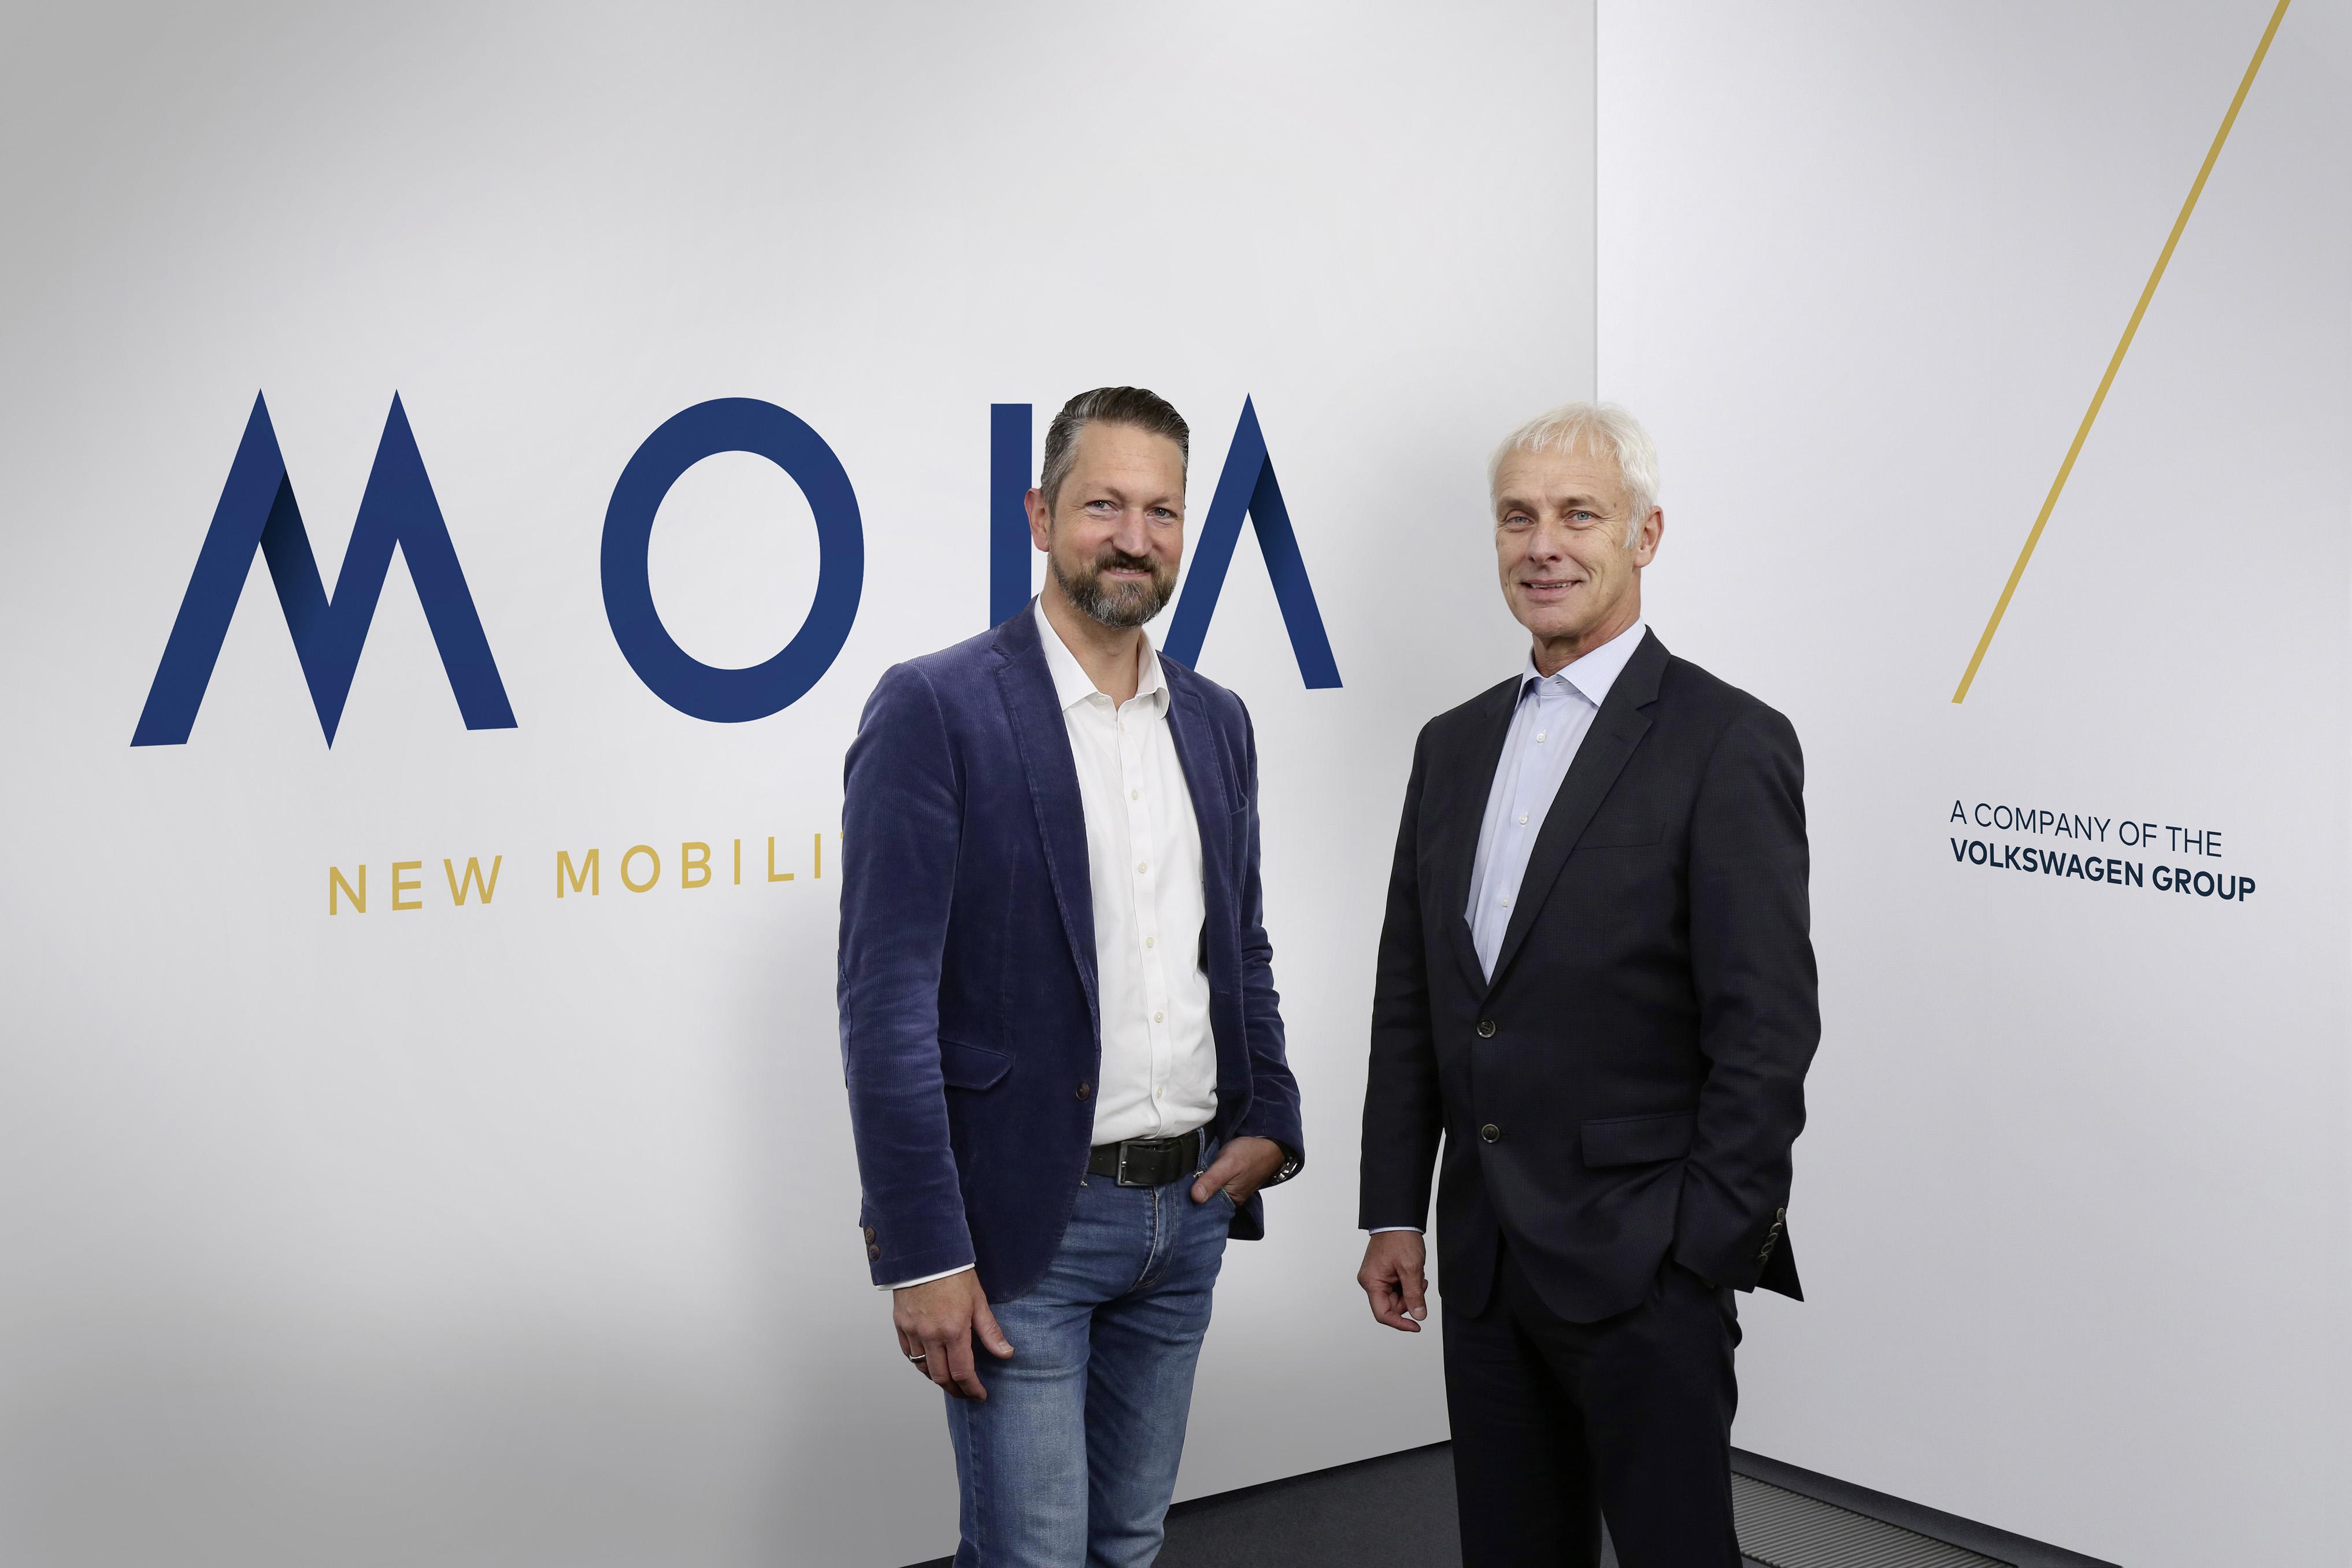 Ole Harms, topman Moia en Matthias Müller, topman VW